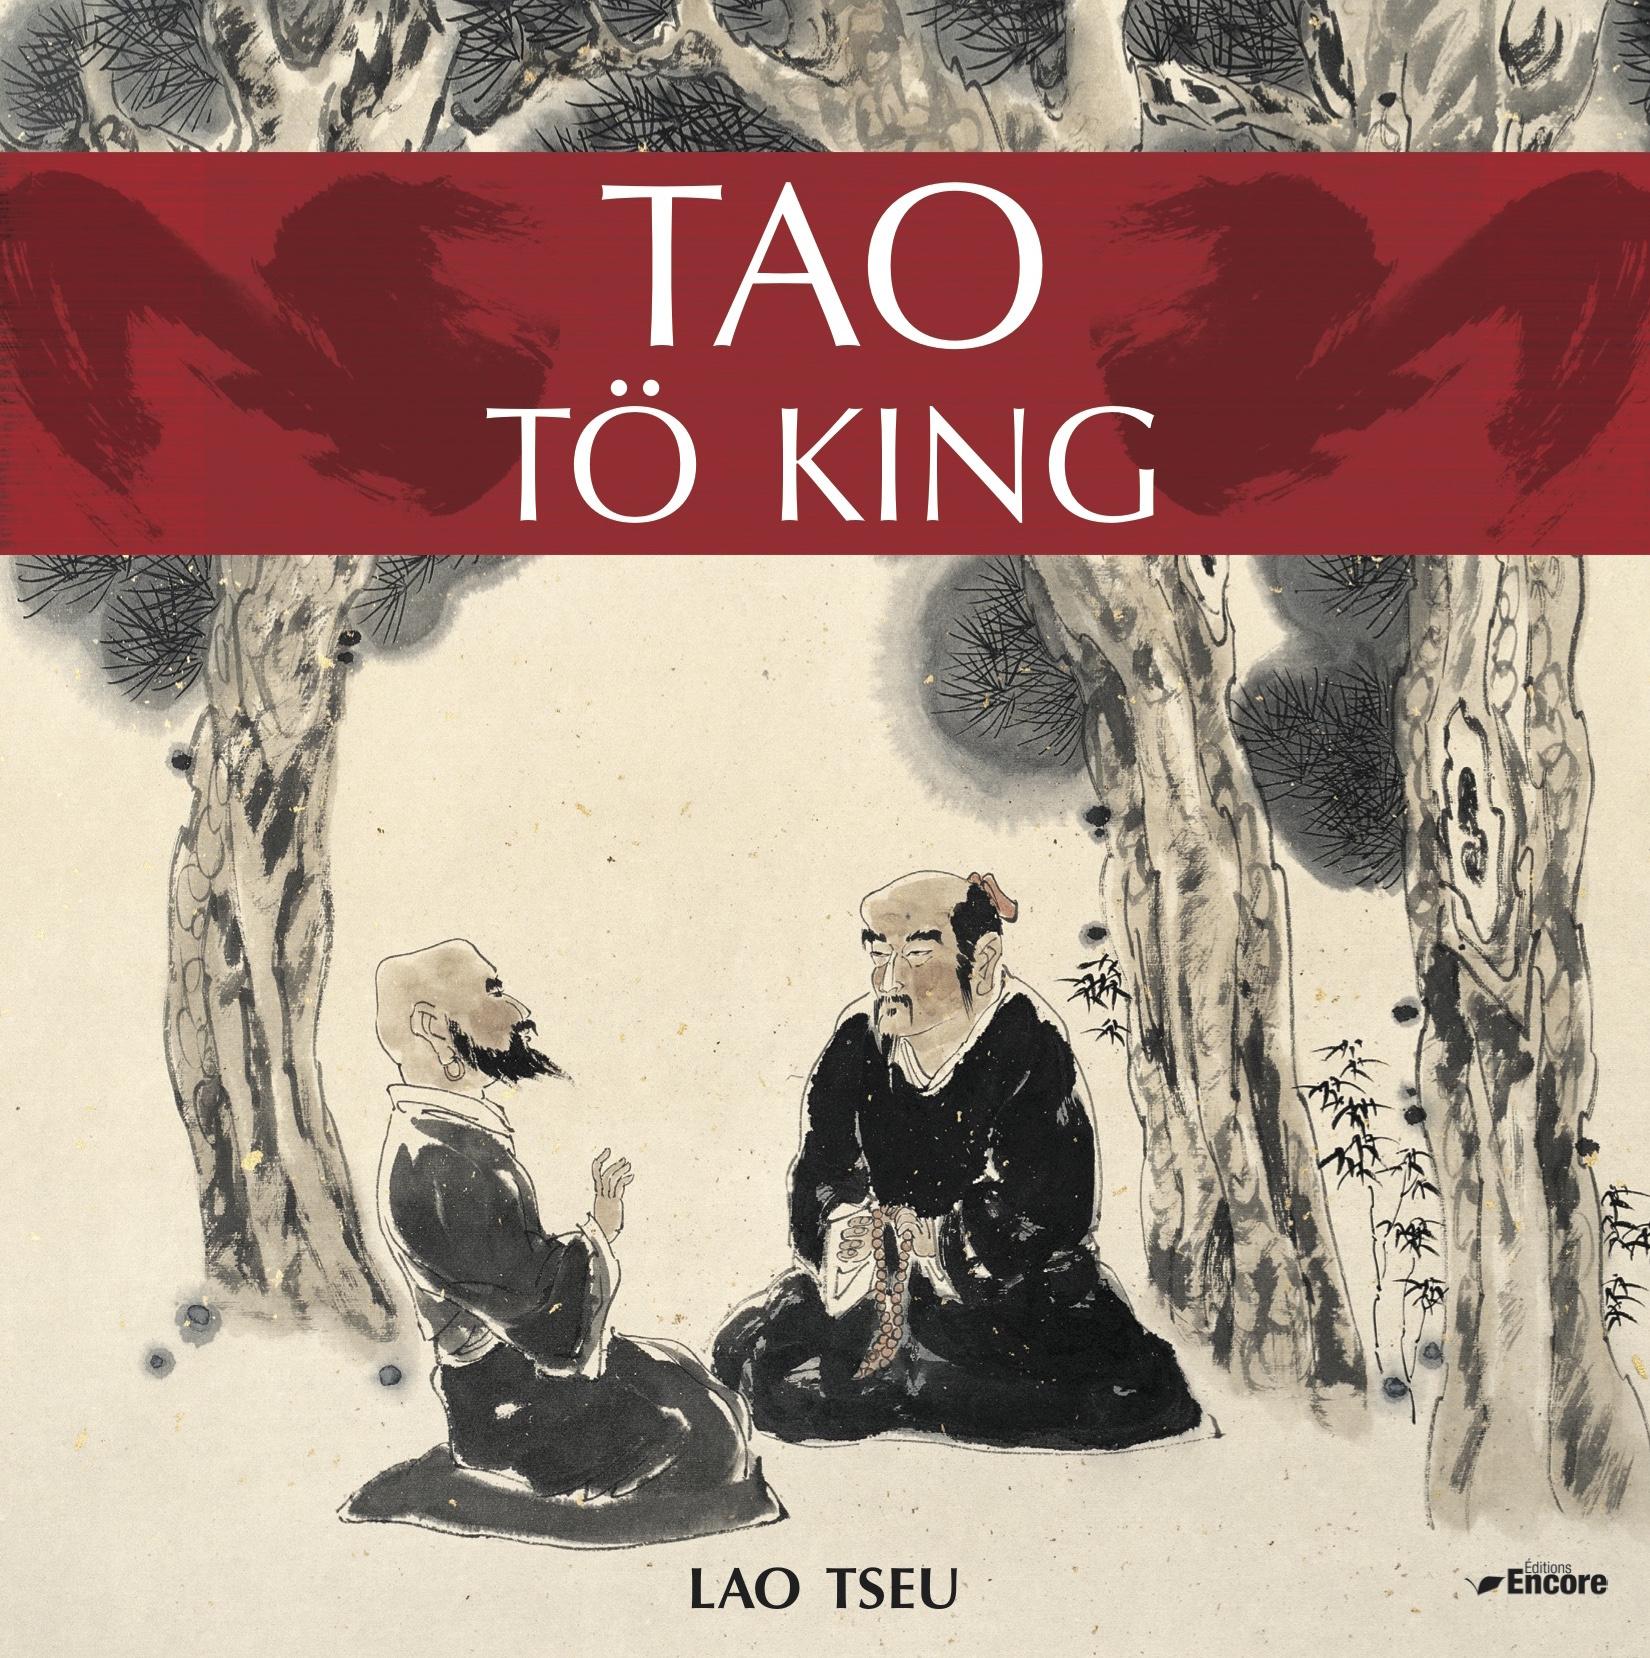 TAO TO KING